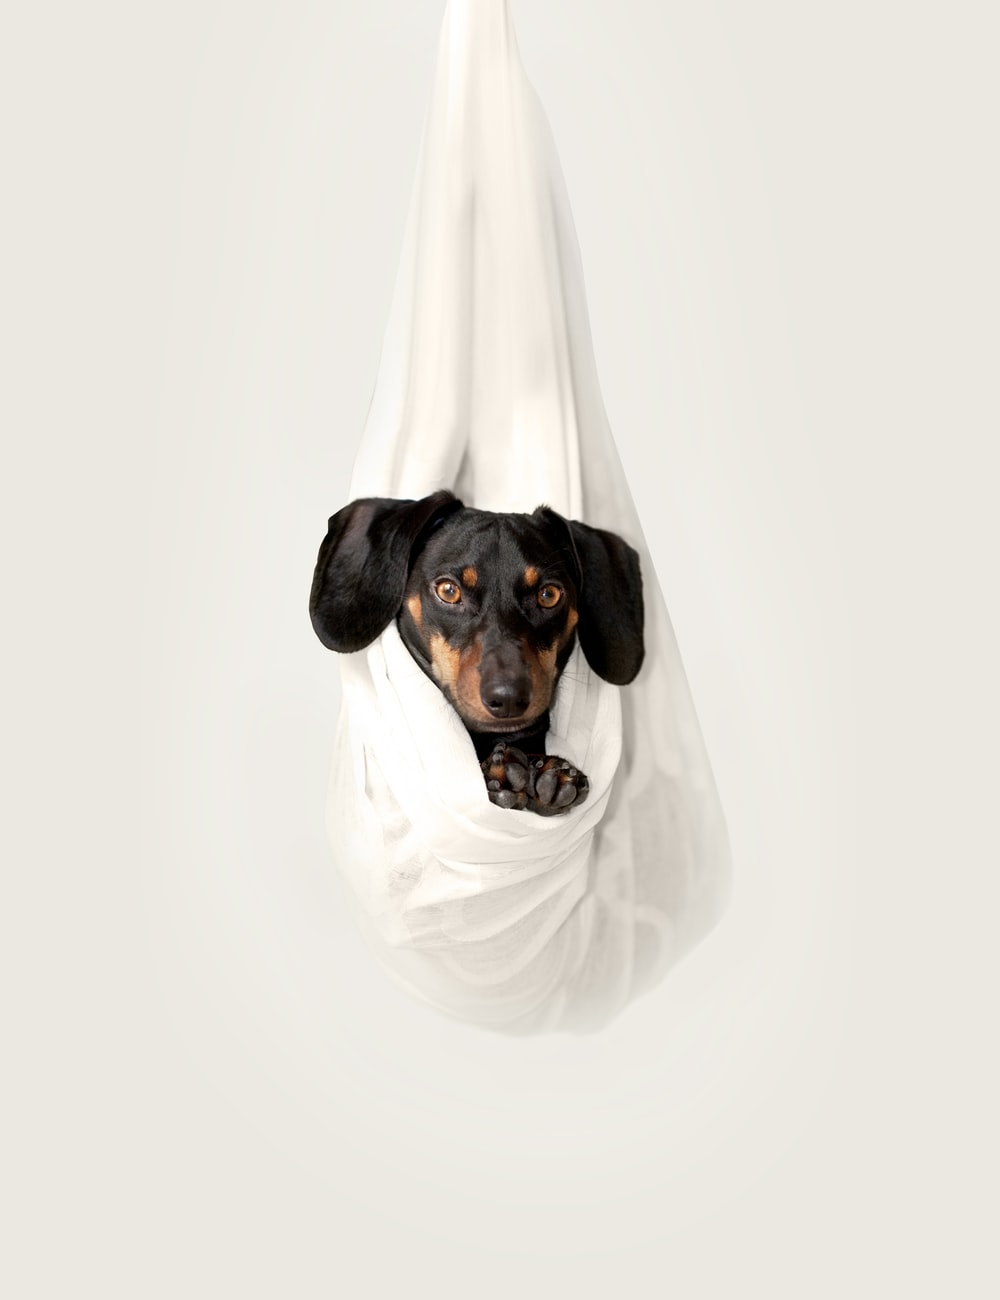 Dachshund resting on white hanged fabric